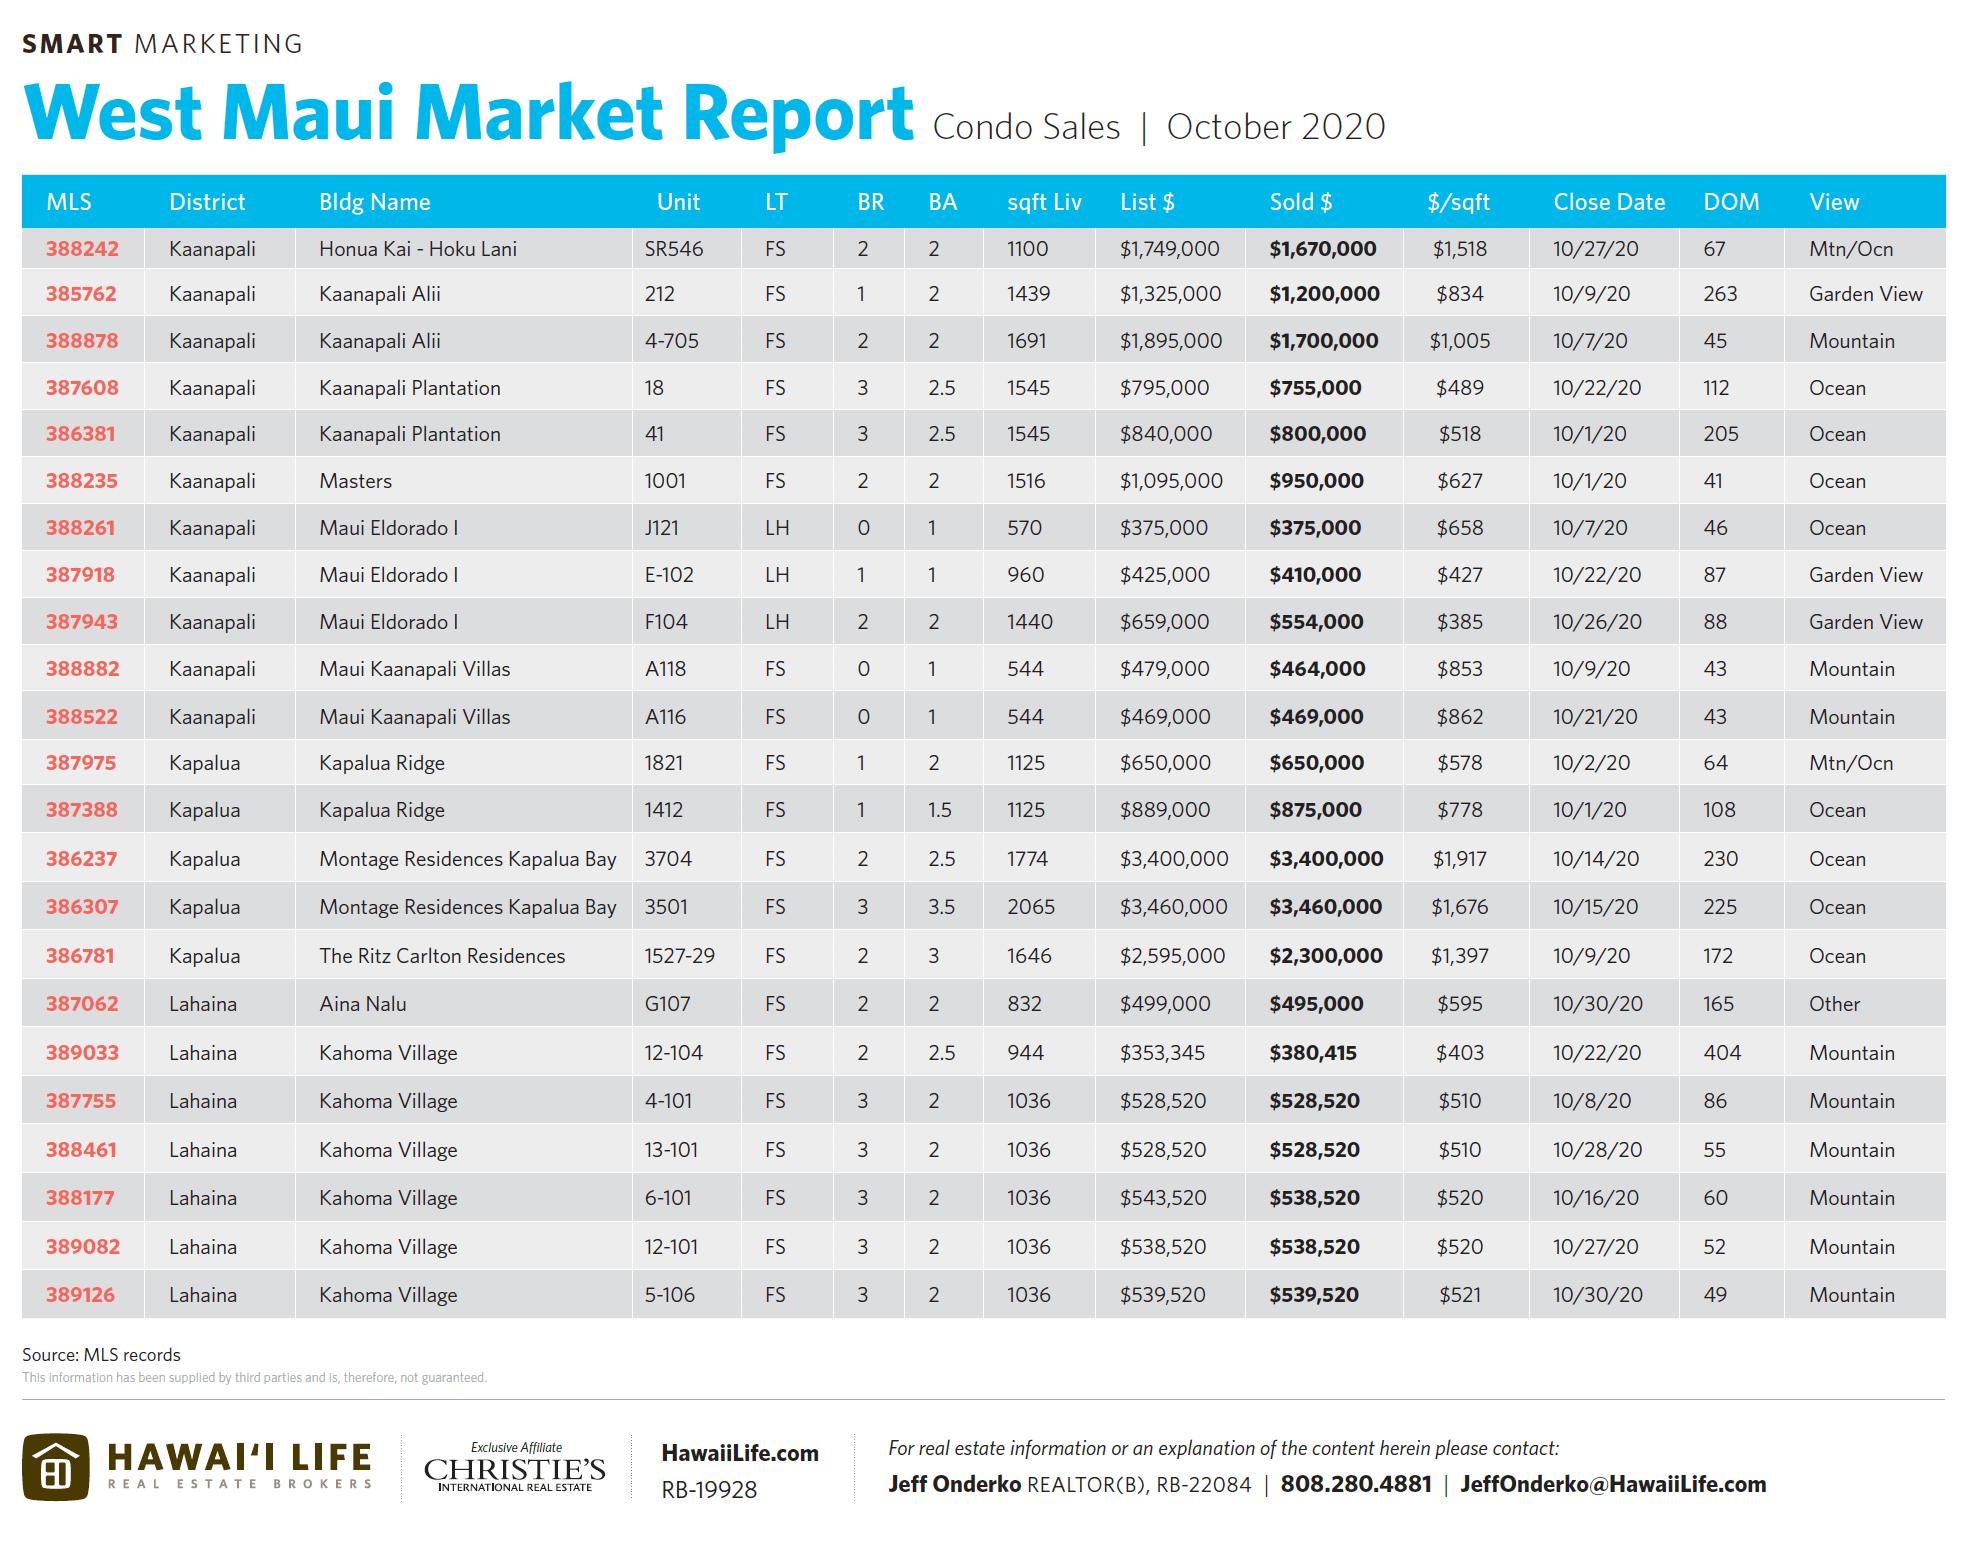 october 2020 west maui condo sales chart